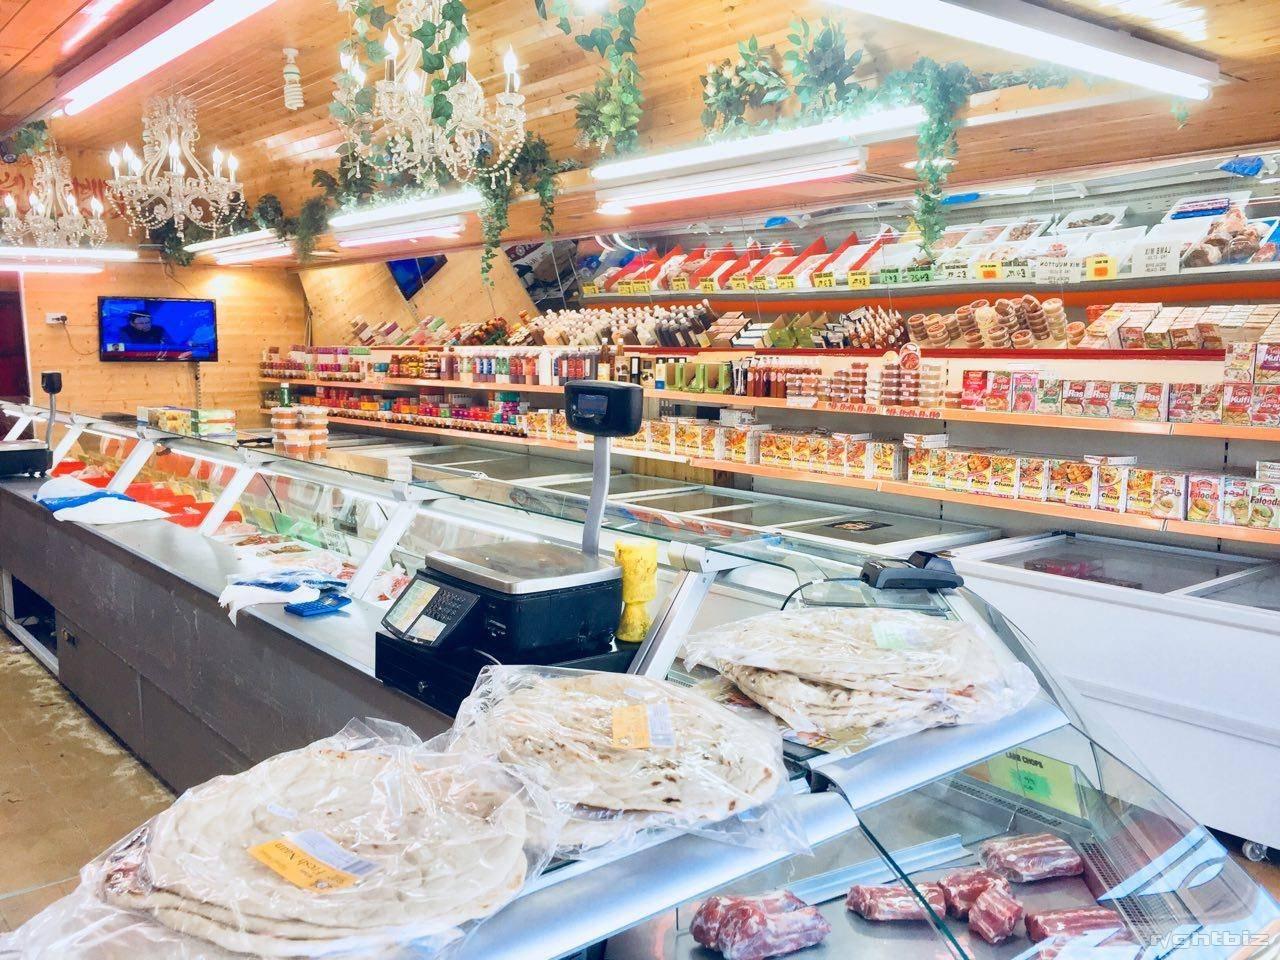 Halal Meat Shop Running Business For Sale - Image 2